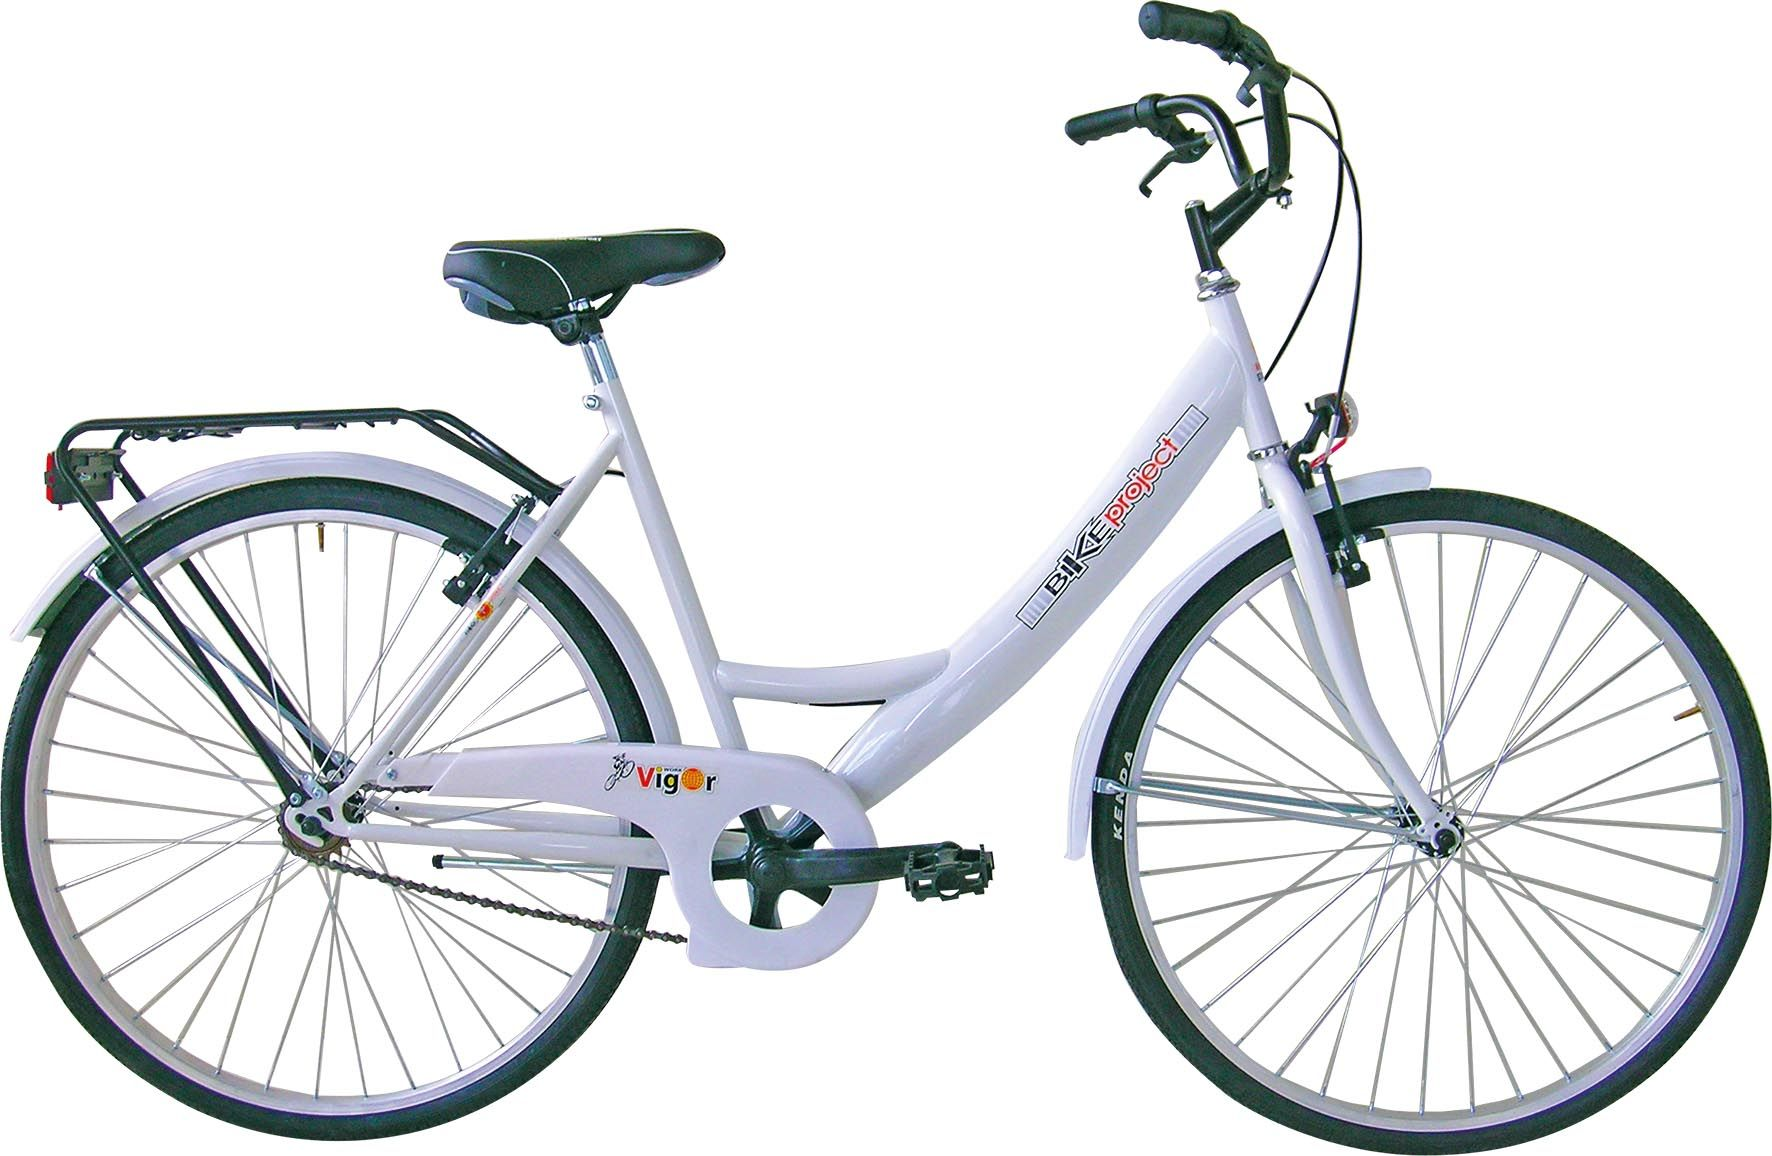 Bicicletta Olanda